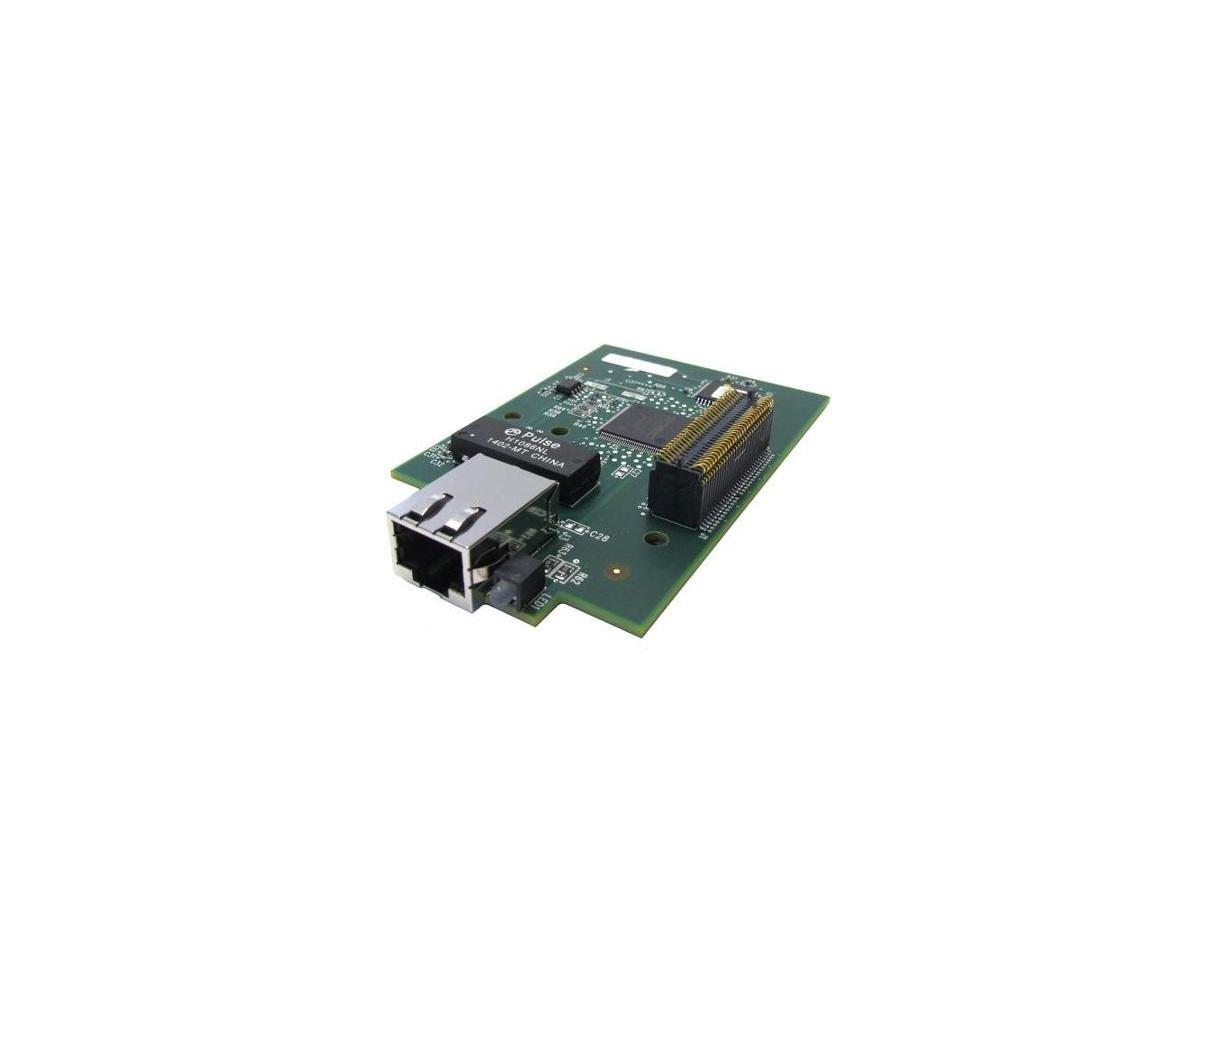 Zebra Print Server 1 X 10/100Base-TX 100Mbps For the ZM4 and ZM6 Printers 79823